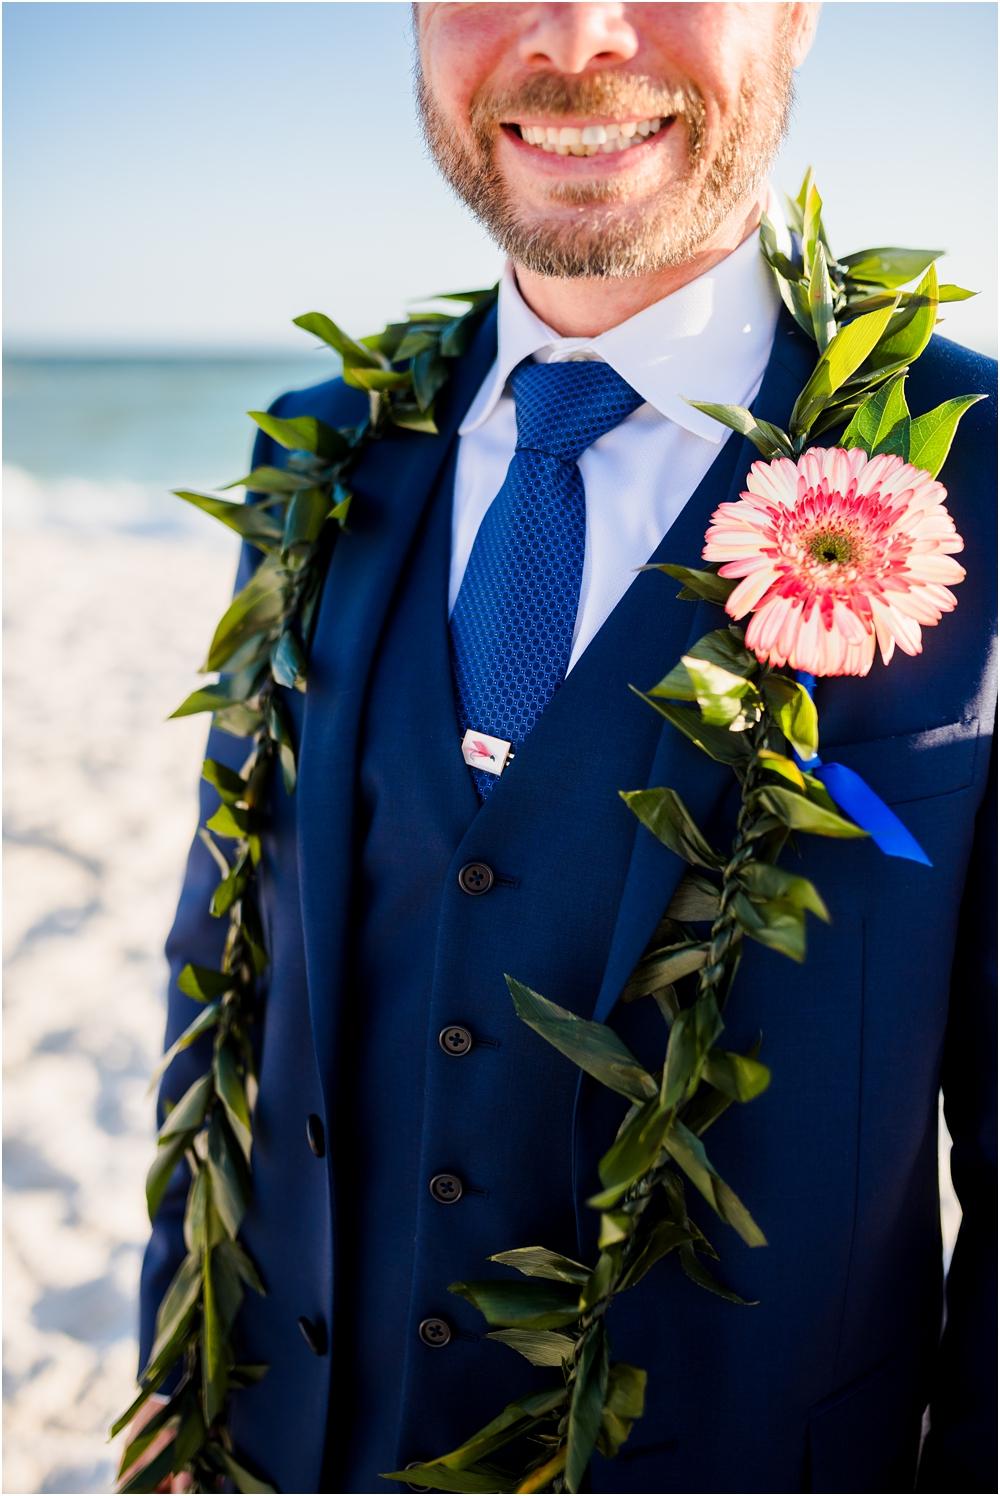 ledman-wedding-kiersten-stevenson-photography-30a-panama-city-beach-dothan-tallahassee-(285-of-763).JPG